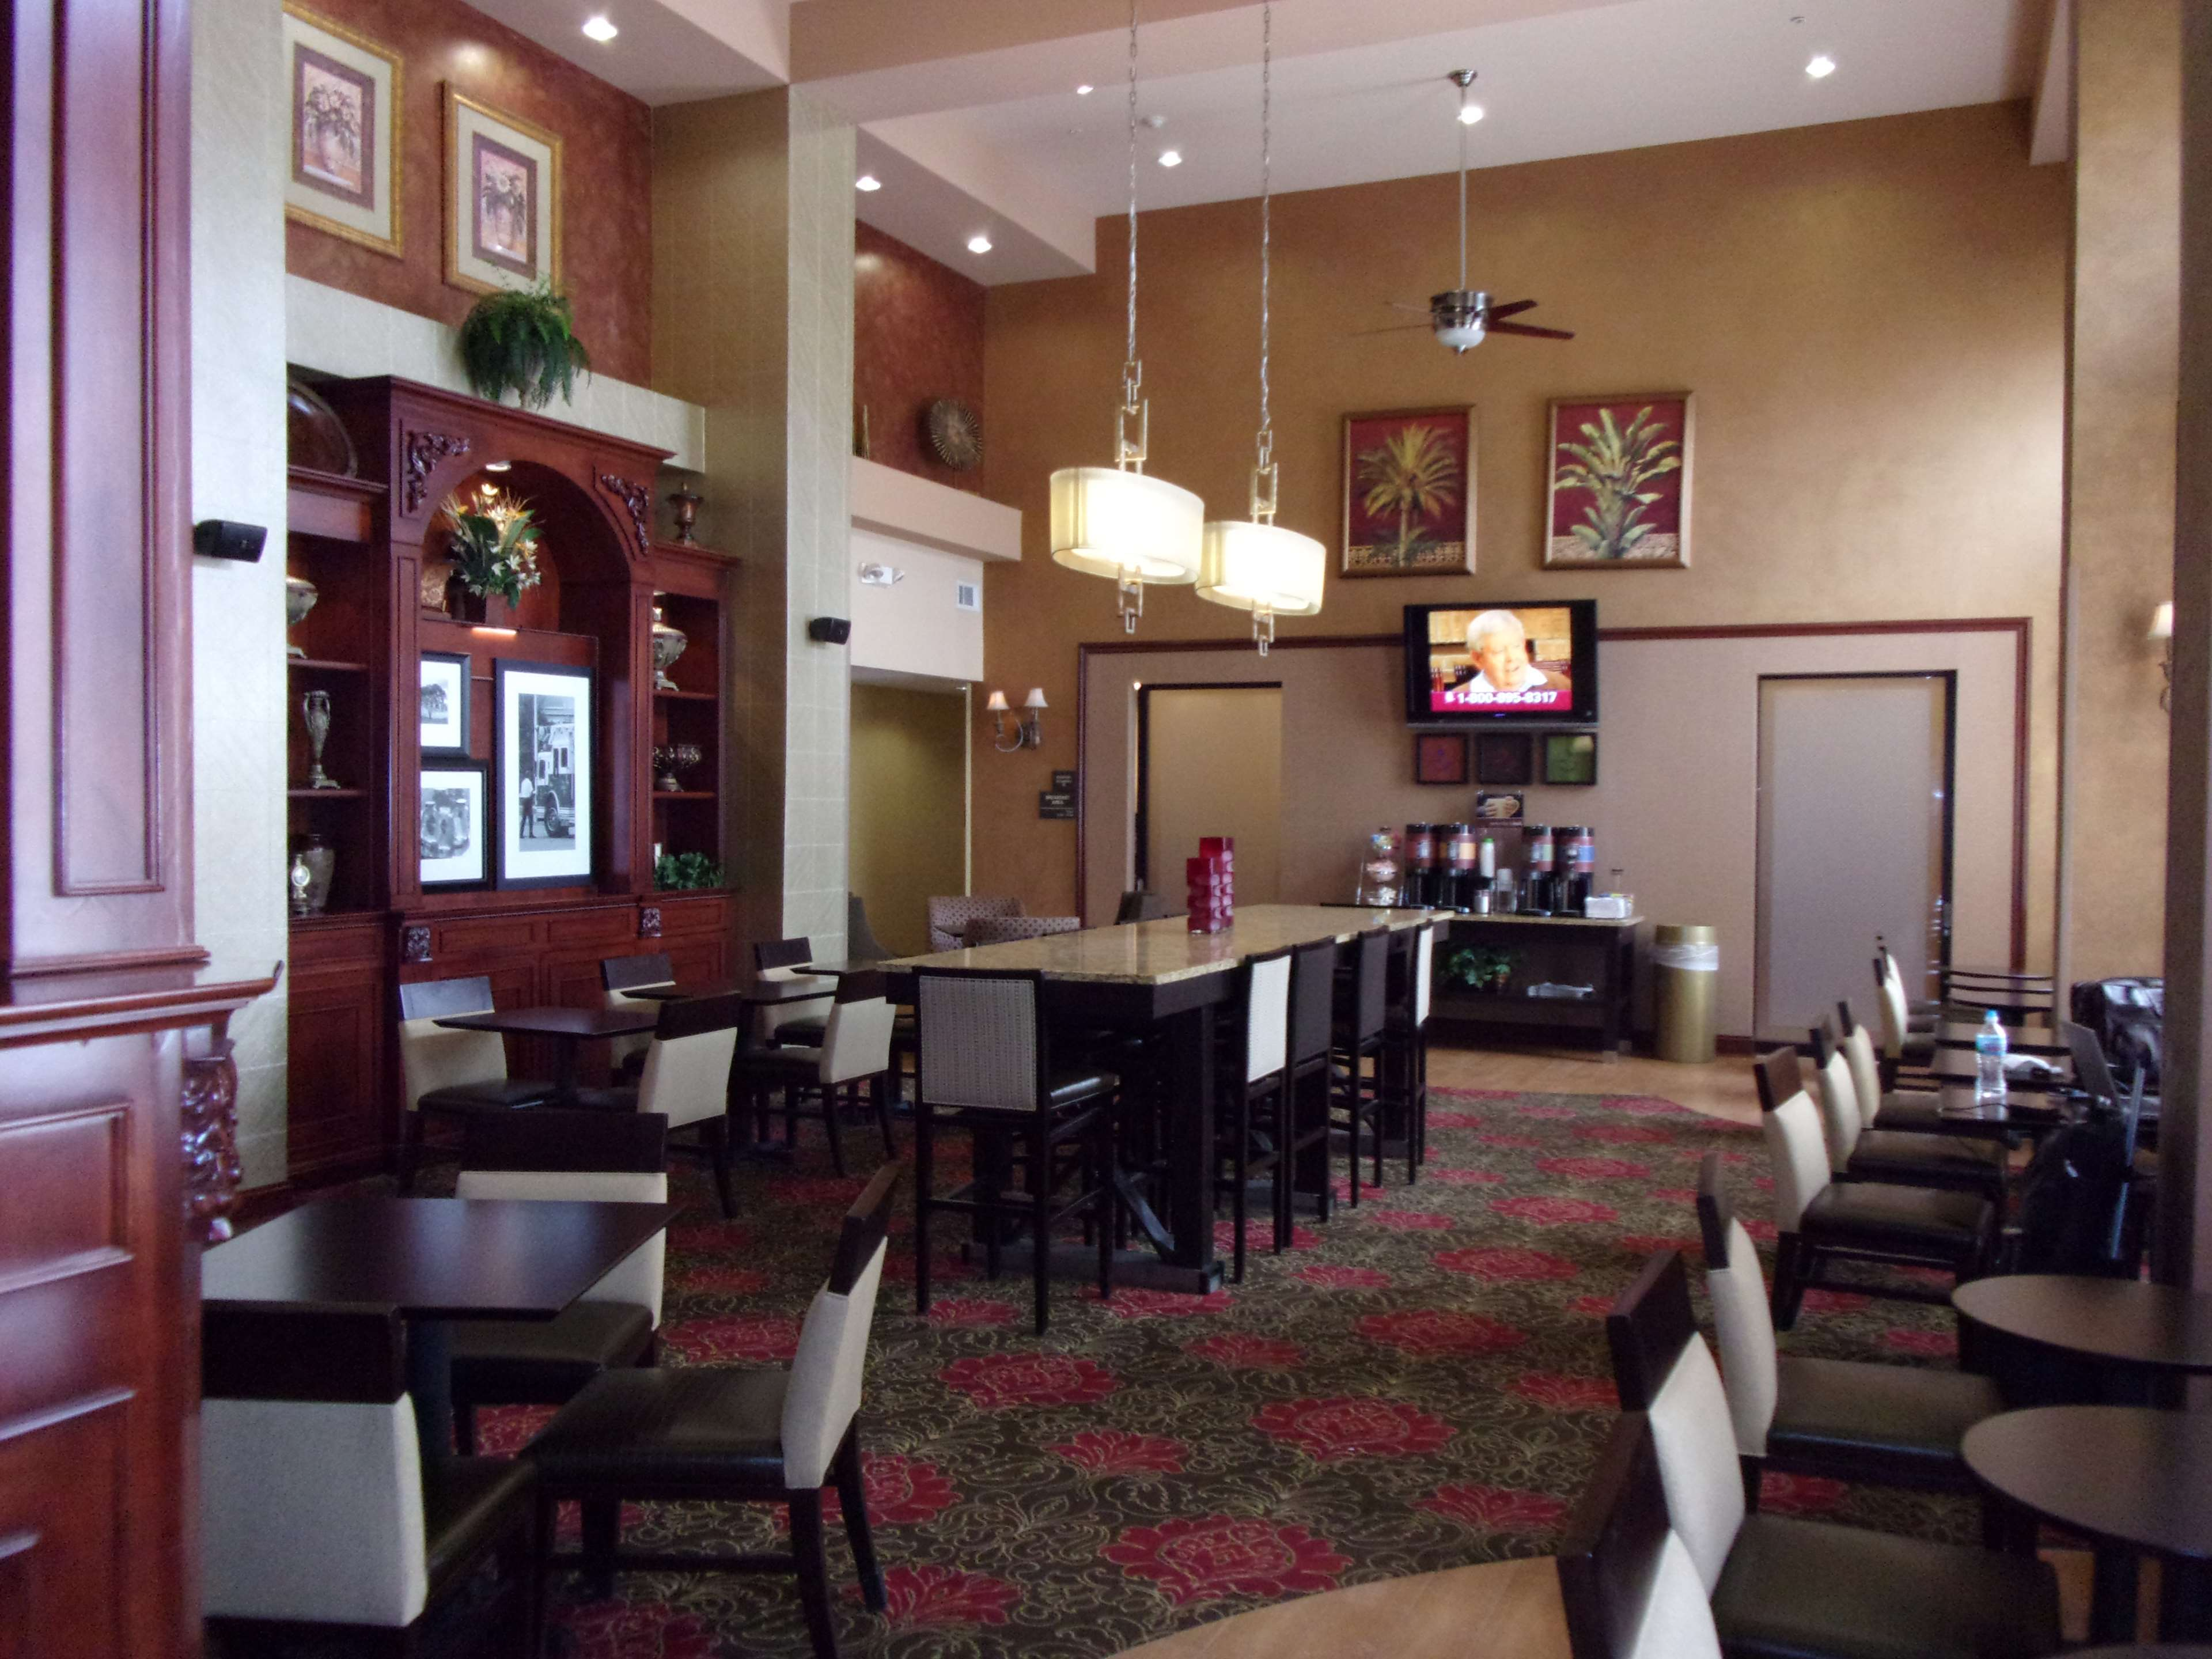 Hampton Inn & Suites Bolingbrook image 6